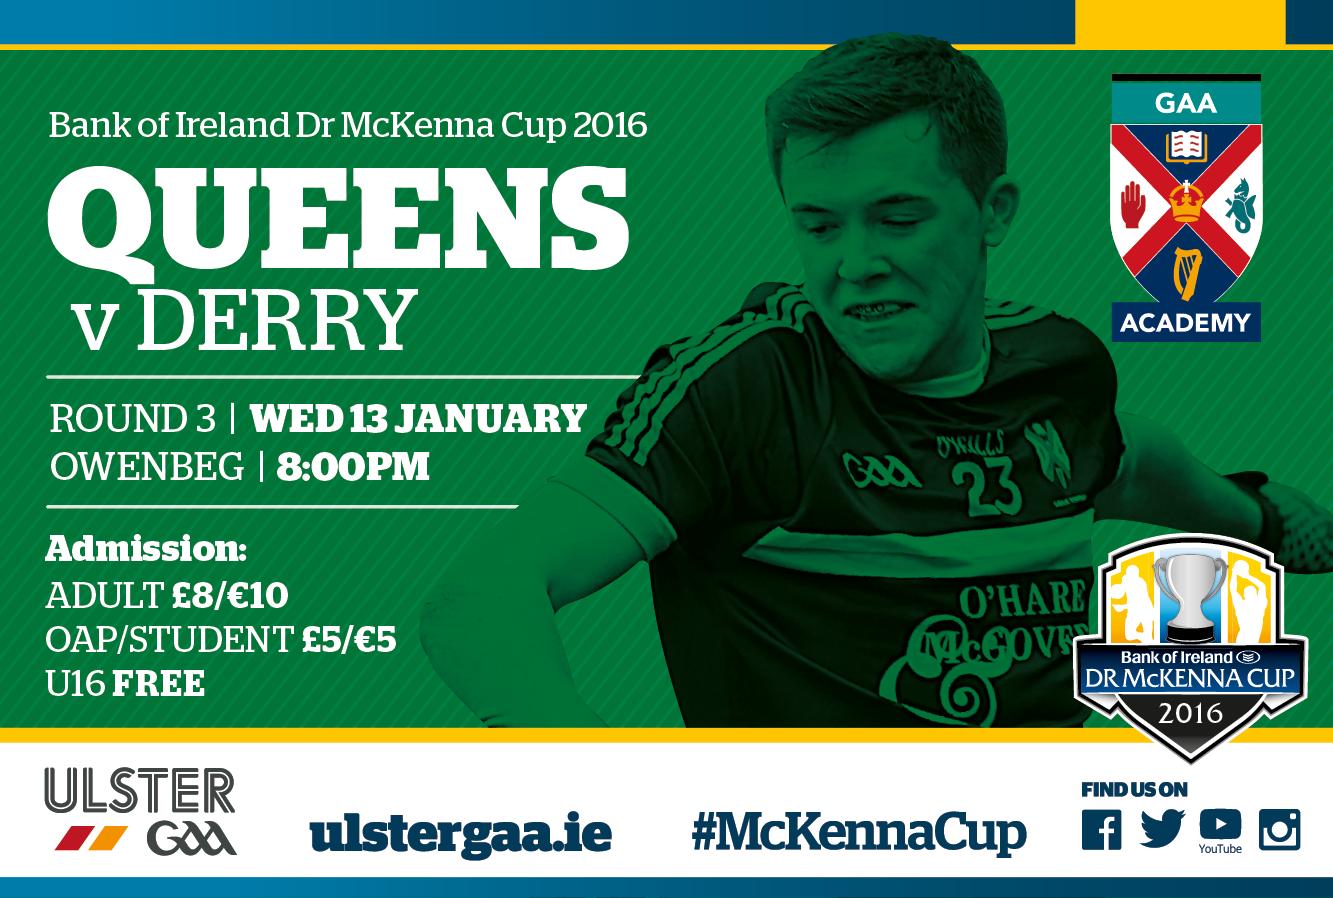 UPDATED: Round 3 Dr McKenna Cup in Celtic Park